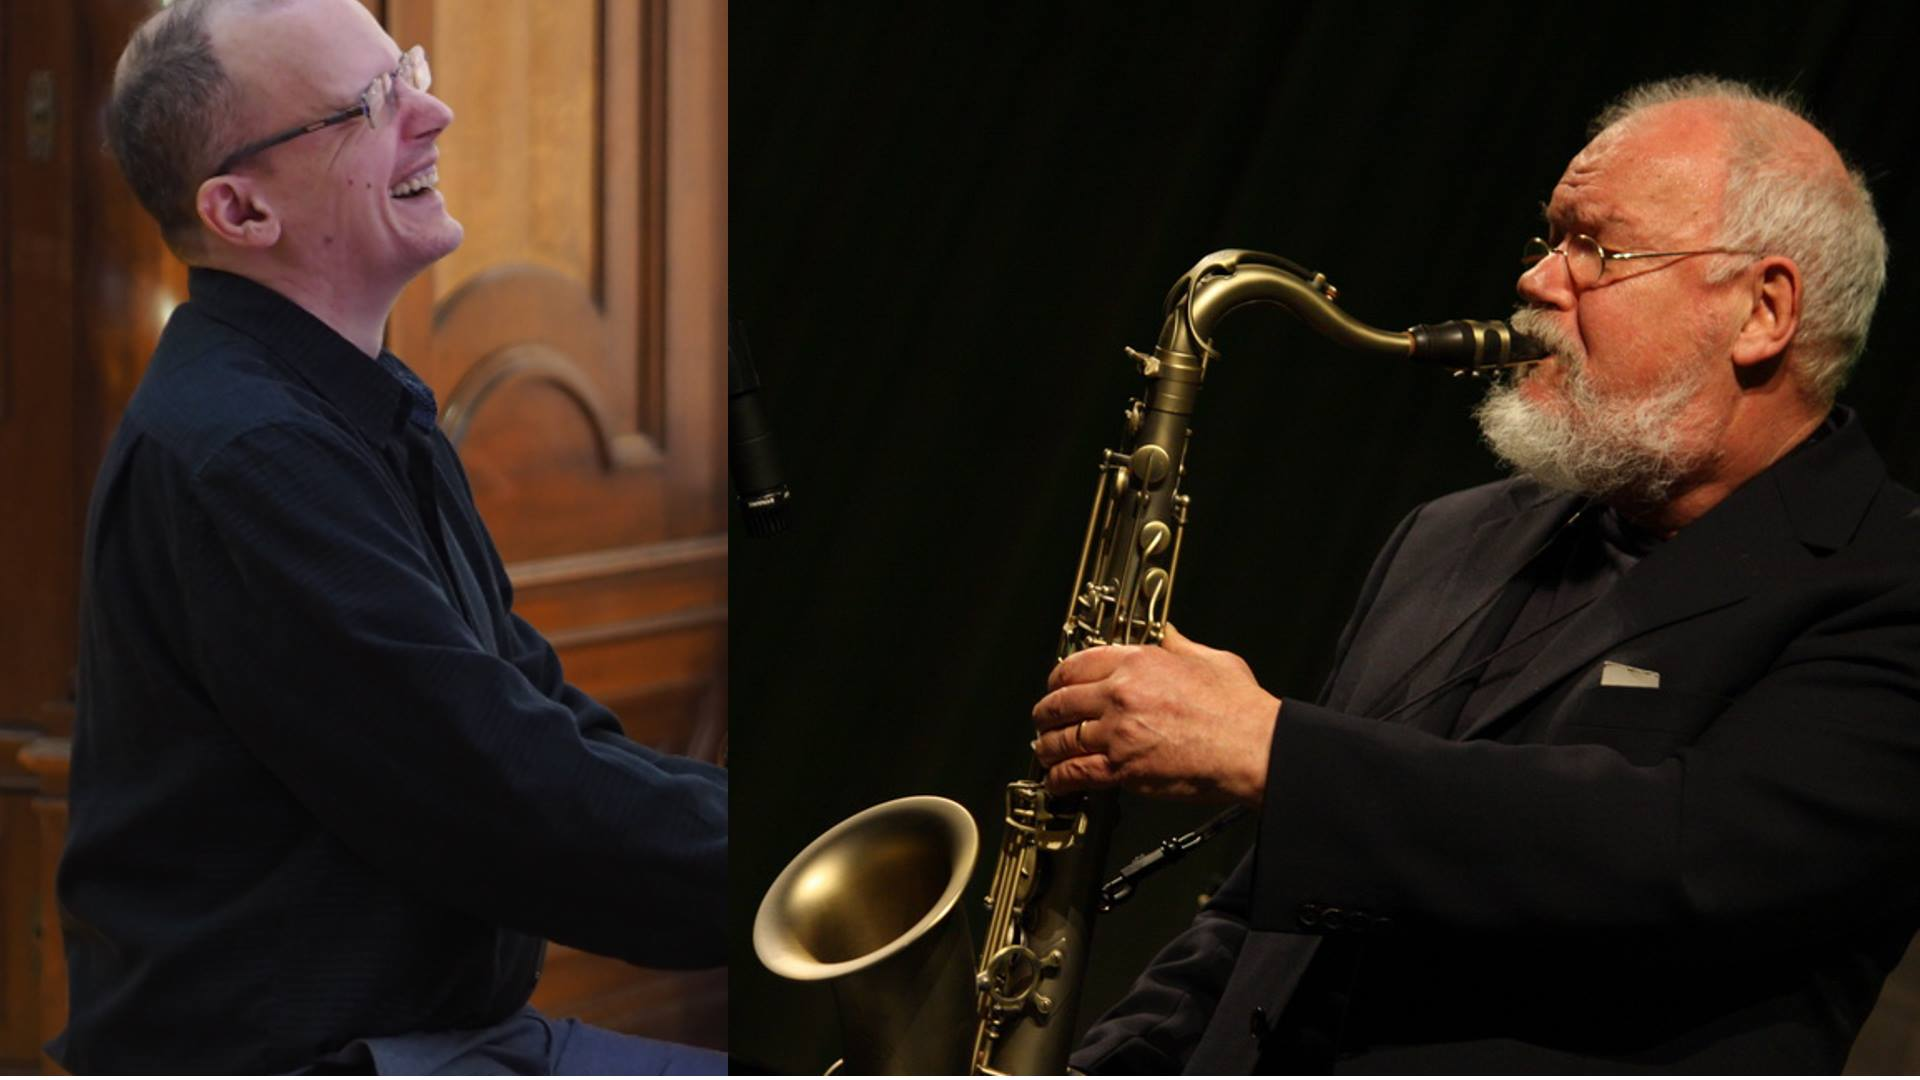 Johannes Thoma un Ralf Rothkegel